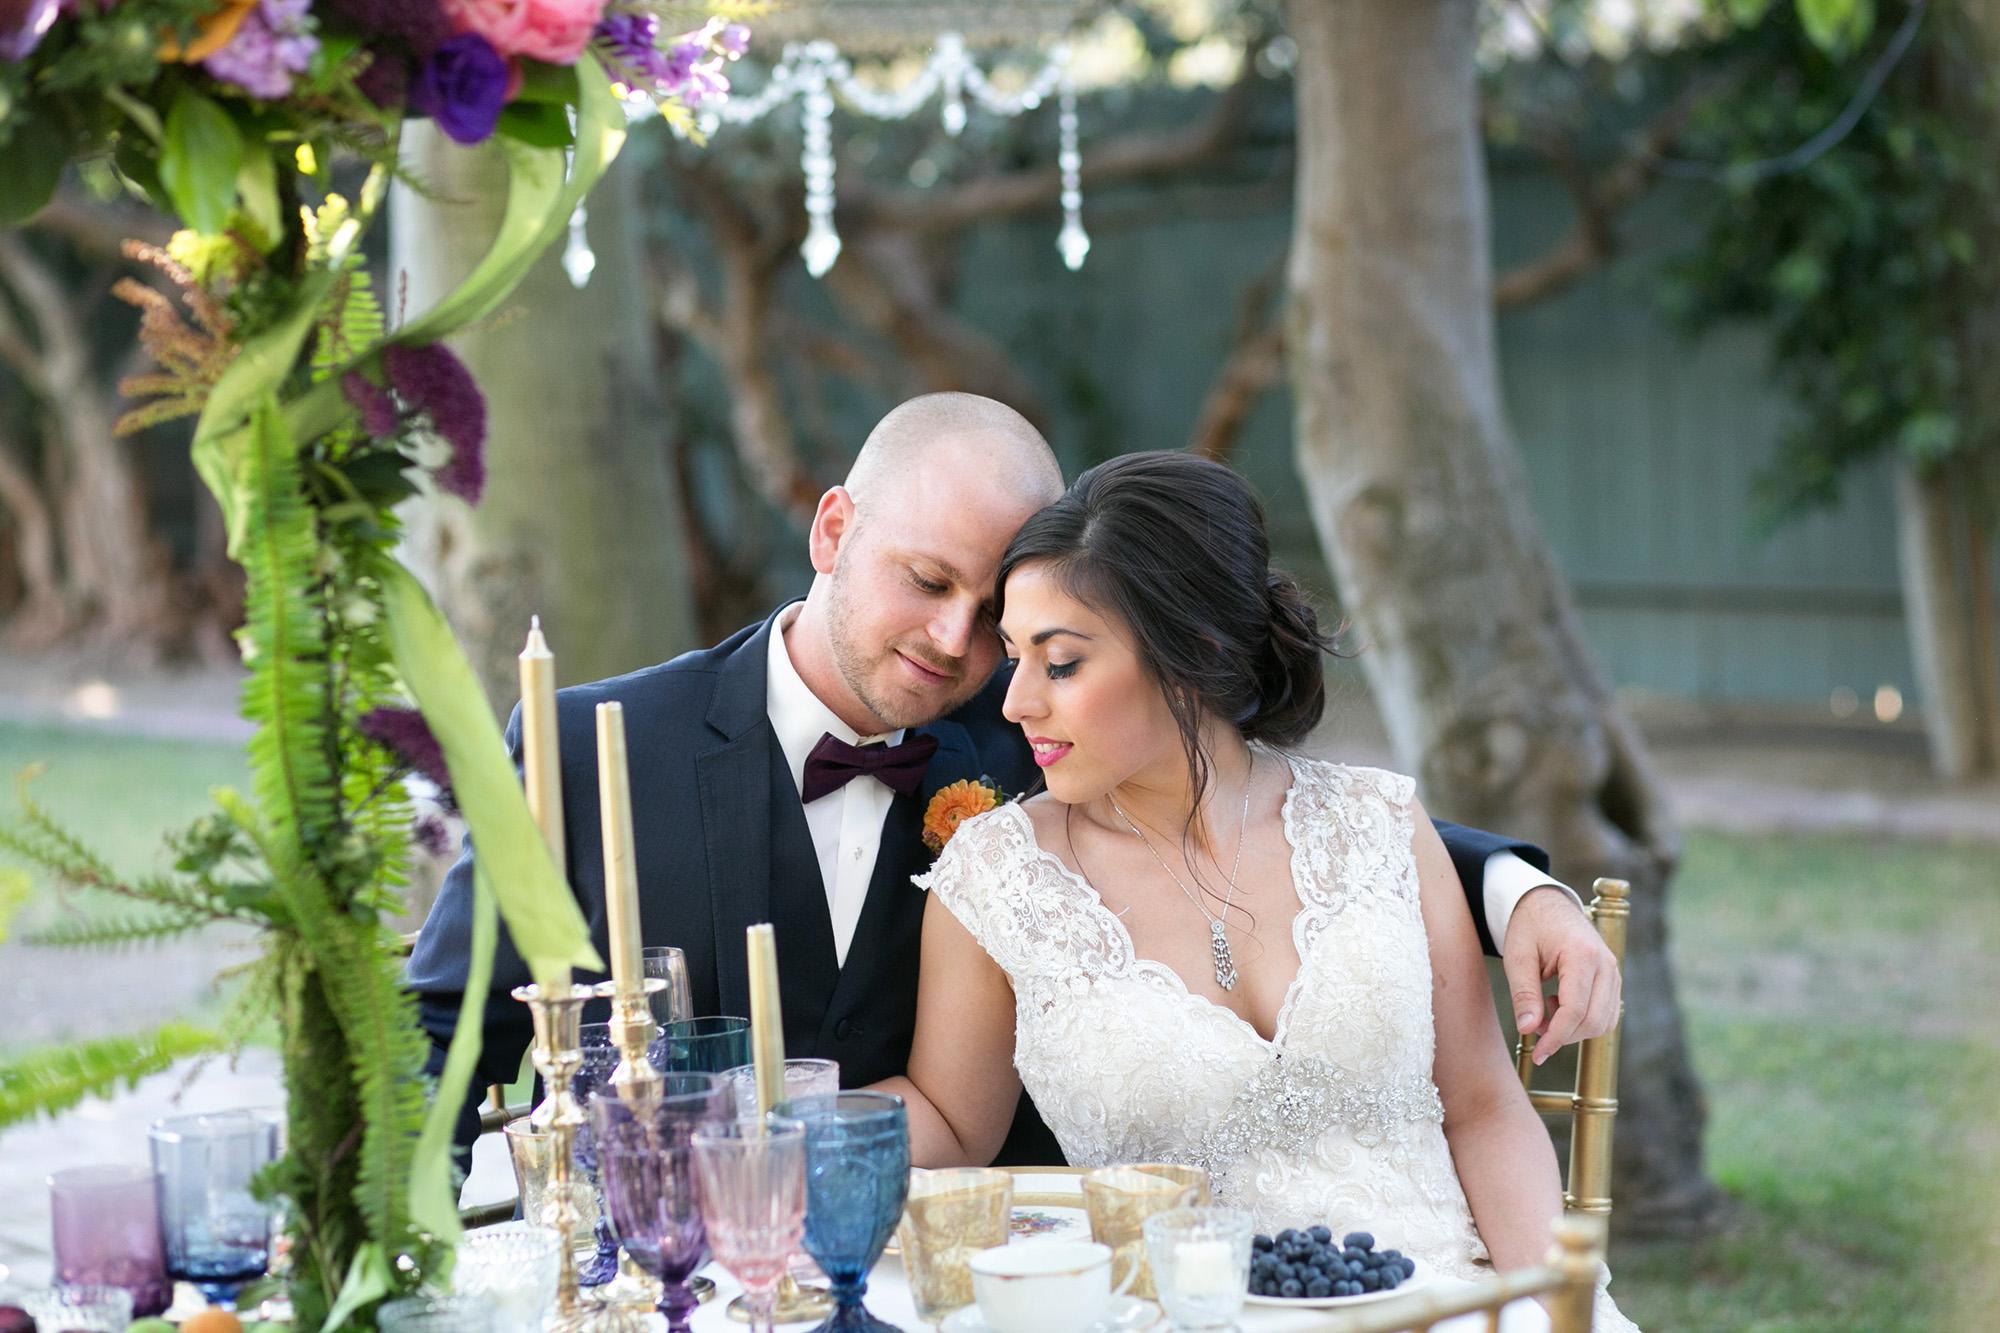 christmas-house-weddings-receptions-carrie-vines-157.jpg